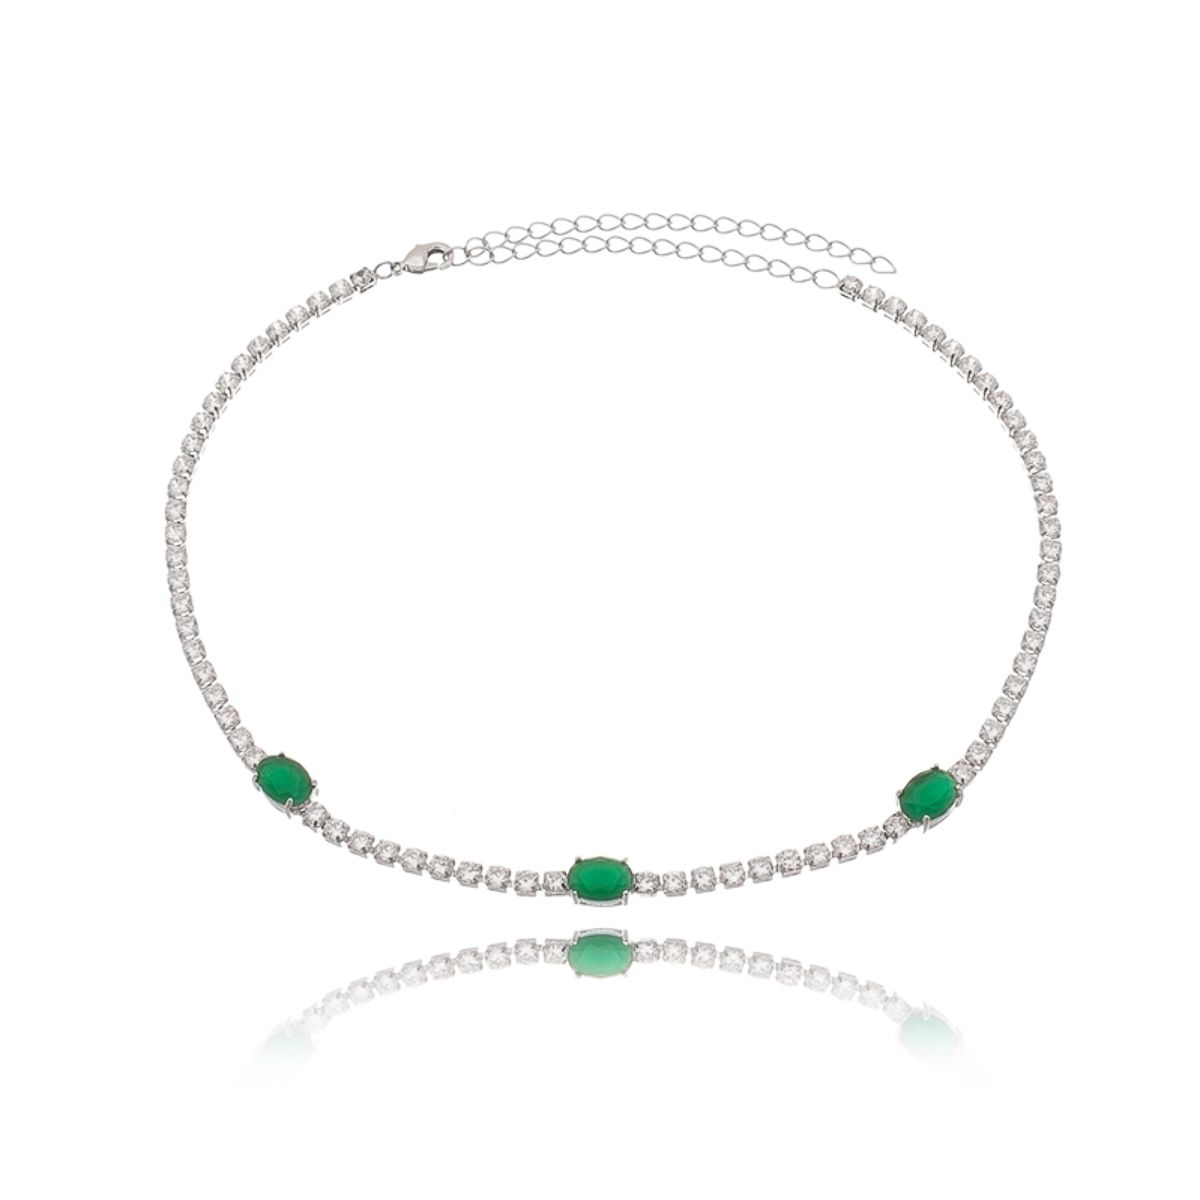 Colar Choker Riviera Esmeralda com Zircônia Branca Semijoia Fina em Ródio Branco  - Soloyou